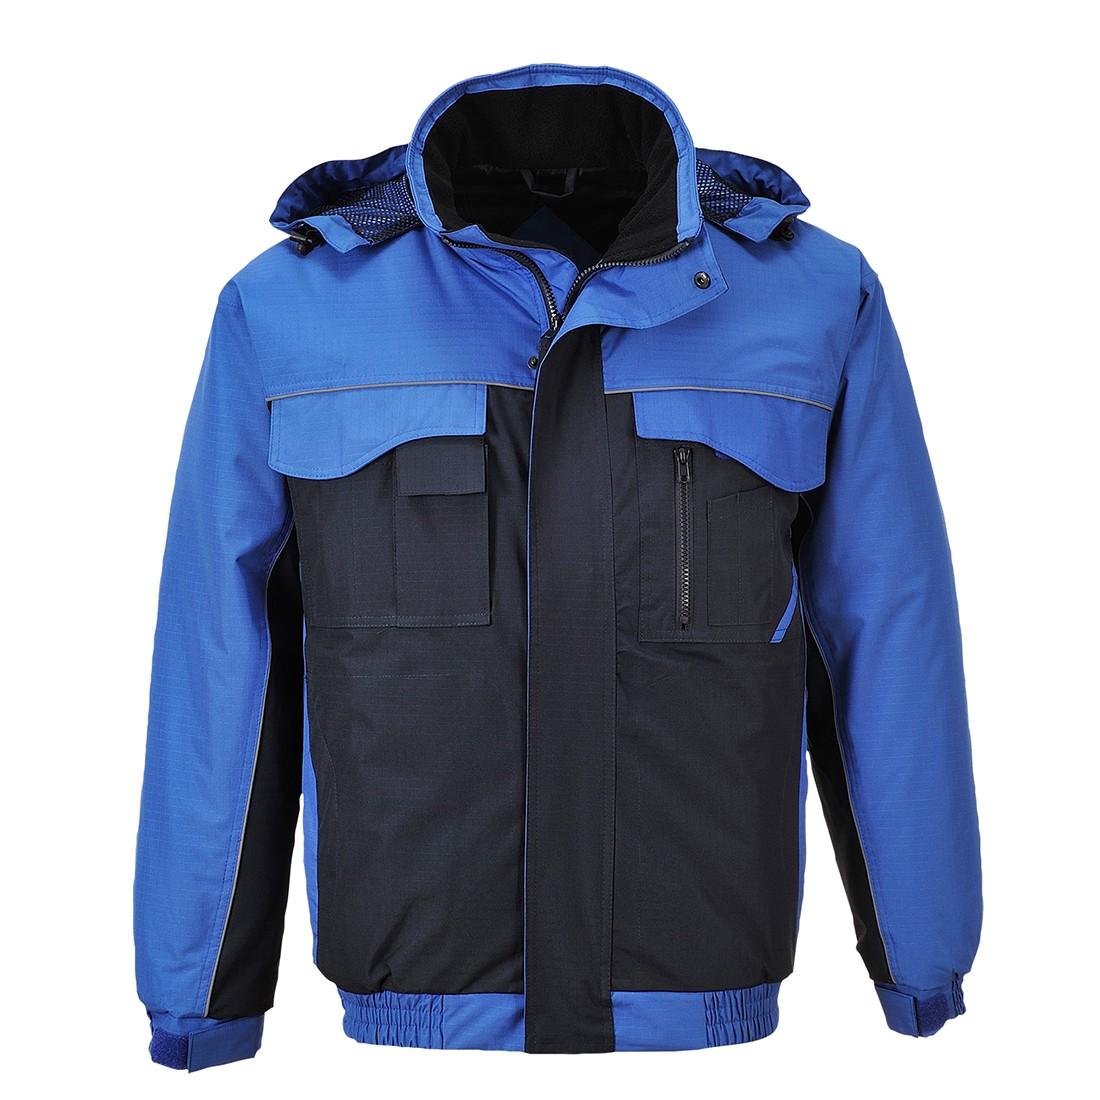 RS Bomber Jacket